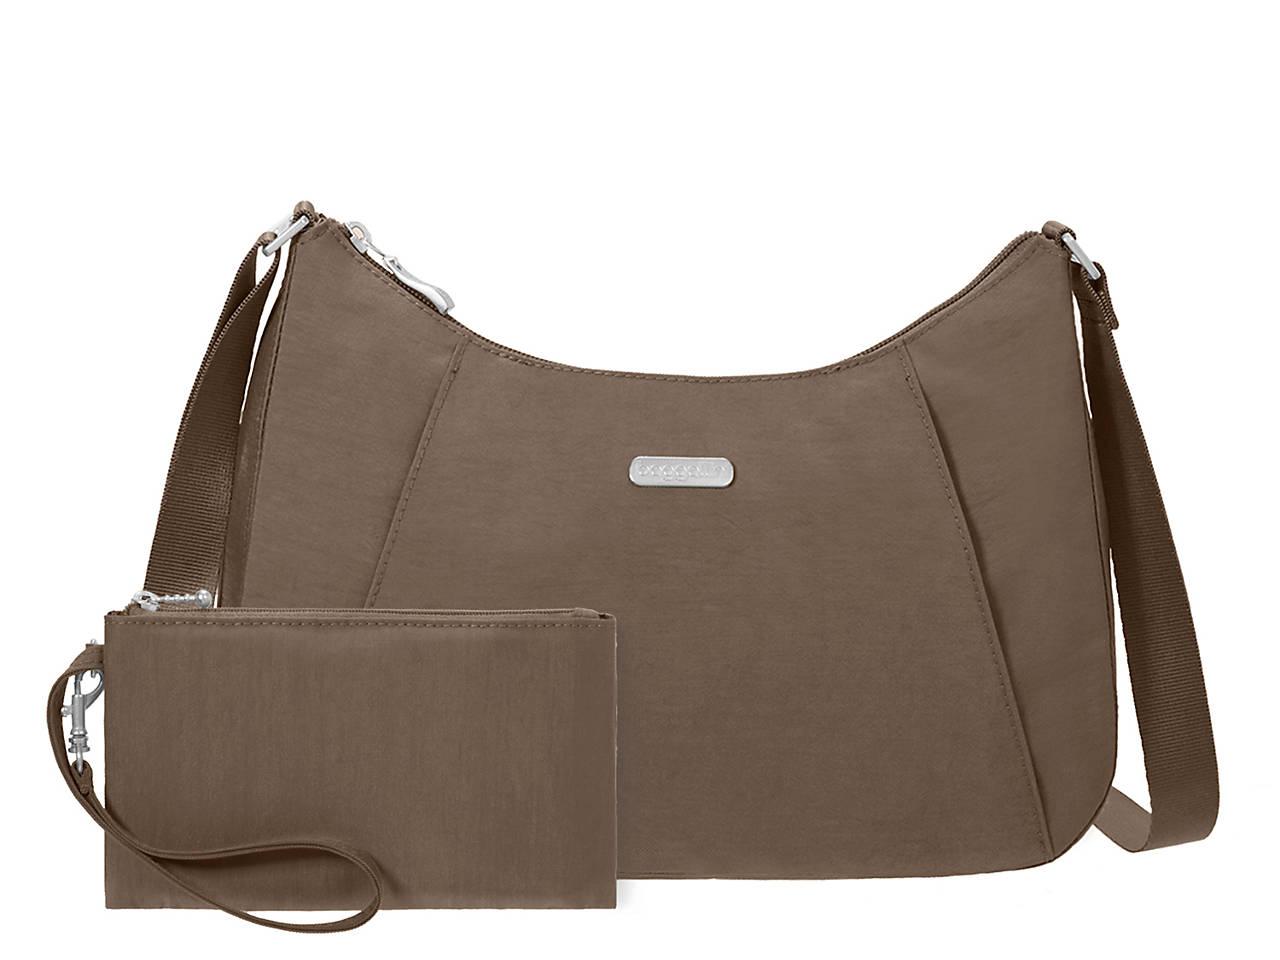 5abb1a72b5 Baggallini Slim Hobo Shoulder Bag Women s Handbags   Accessories